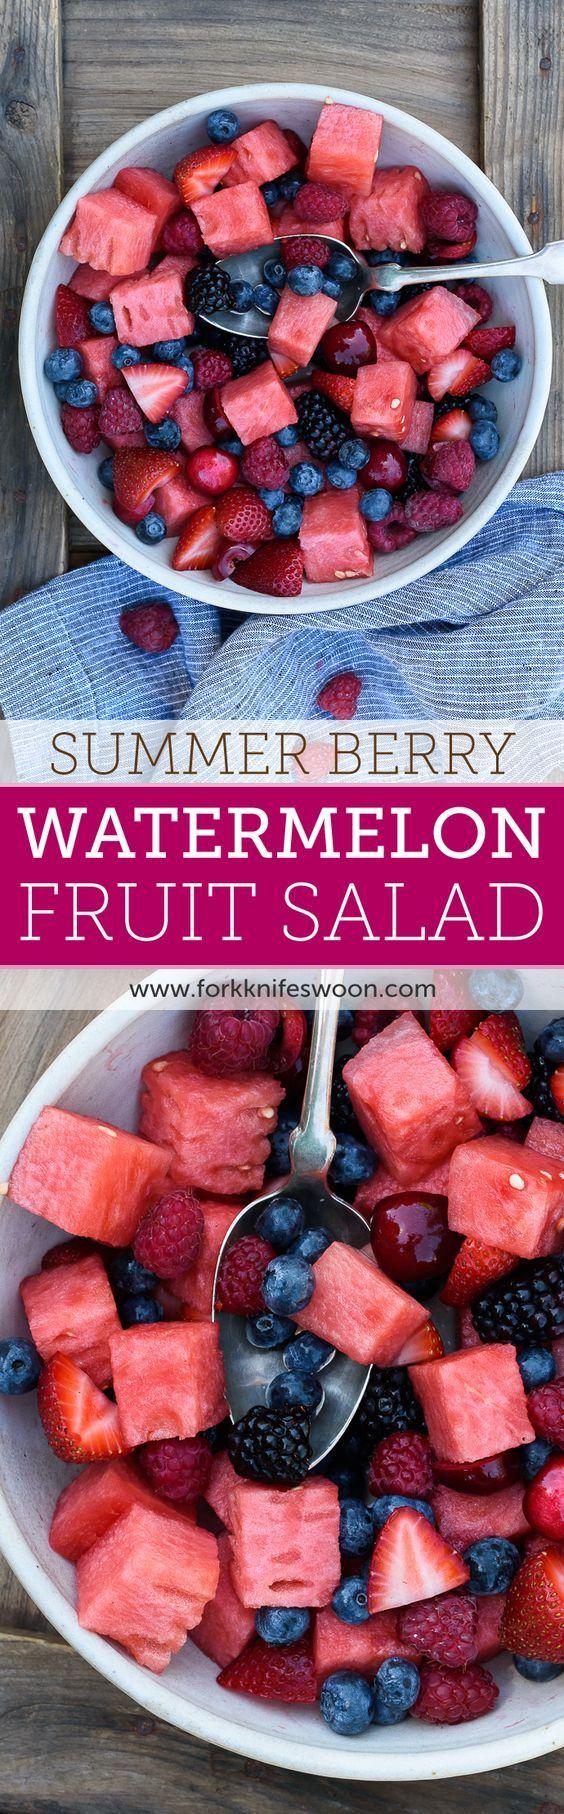 Berry Watermelon Fruit Salad |